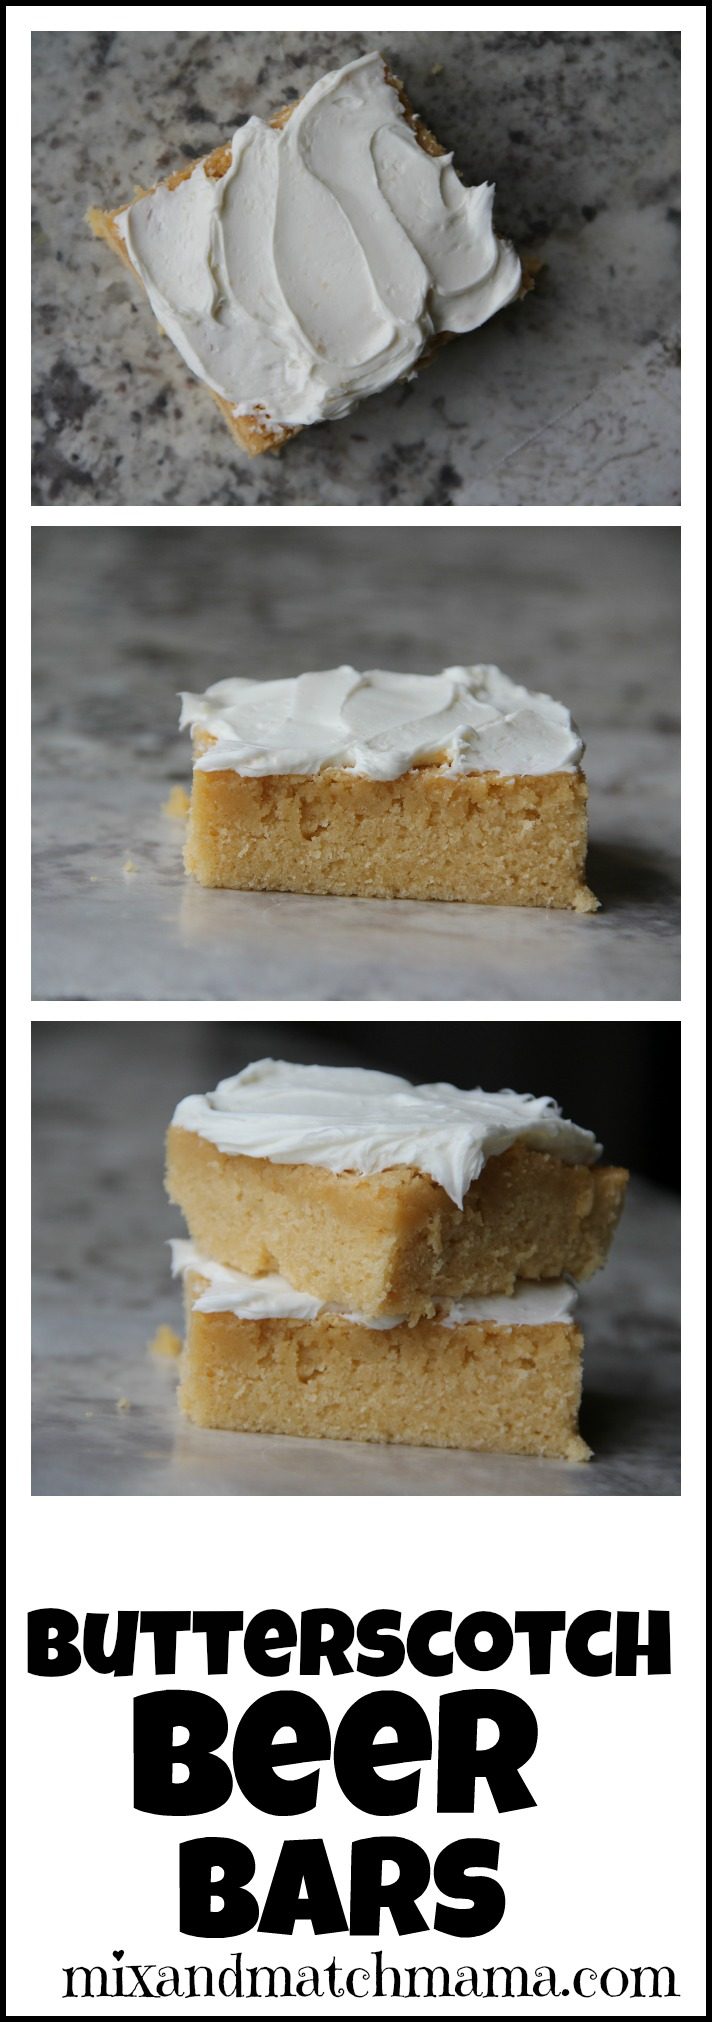 Cake Mix Butterscotch Bars